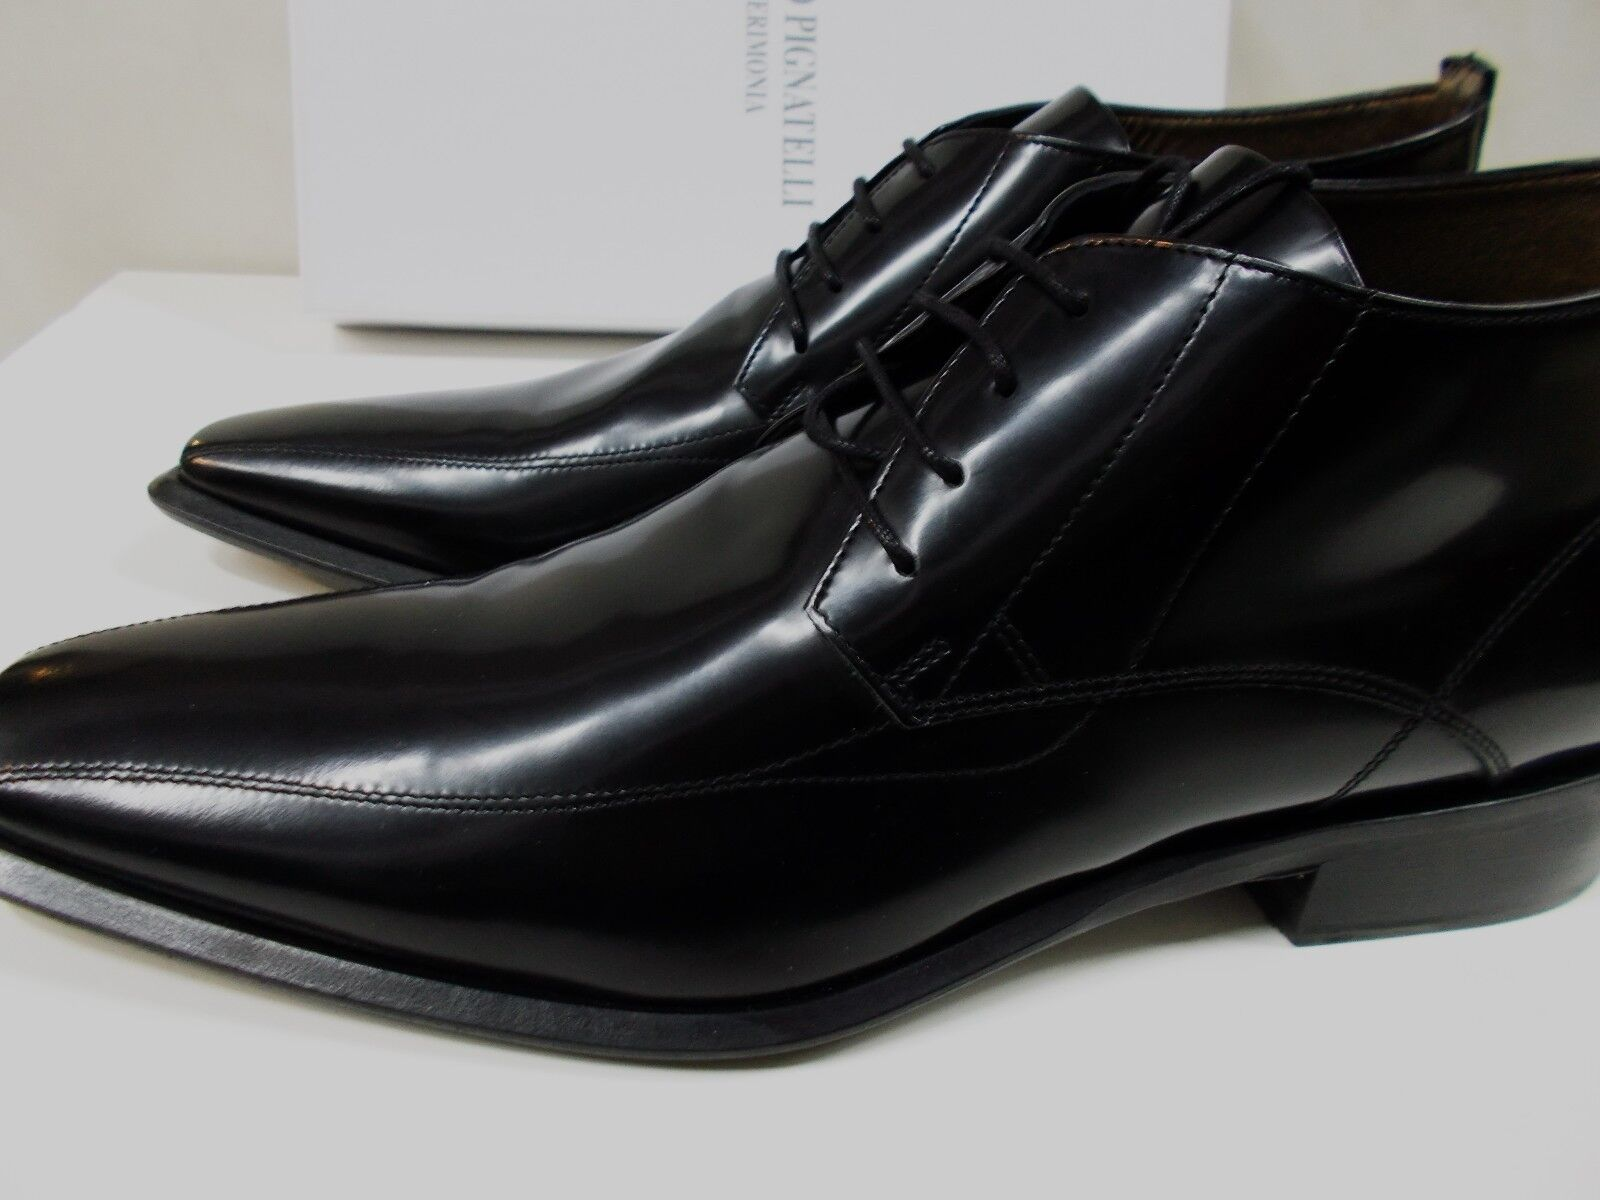 Herrenschuhe n. 44 CBRLO PIGNBTELLI Schuhe man Männer Schuhe МУЖСКАЯ ОБУВЬ